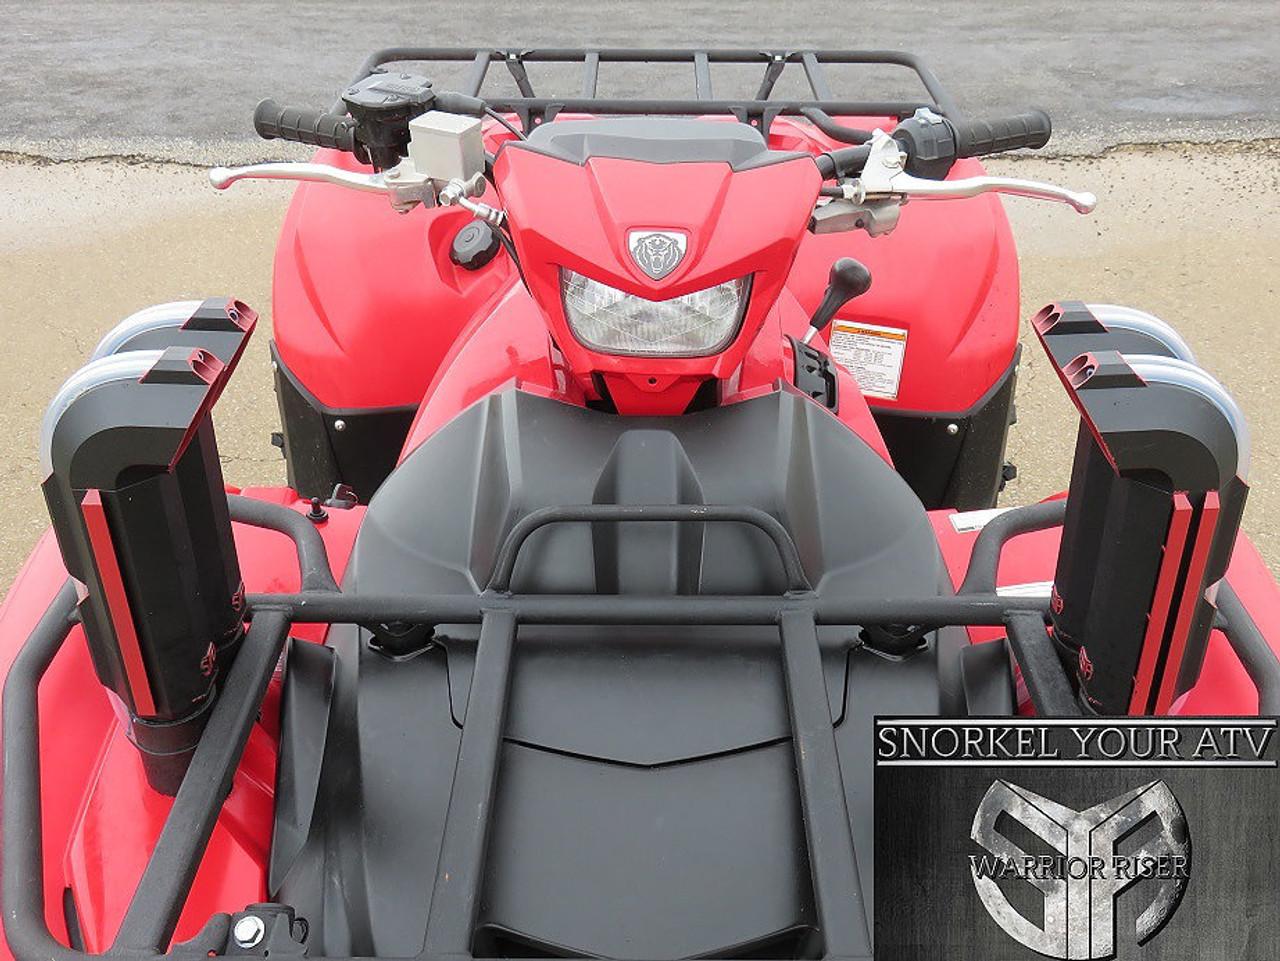 Yamaha Grizzly 700 (16-19) SYA Warrior Snorkel Kit